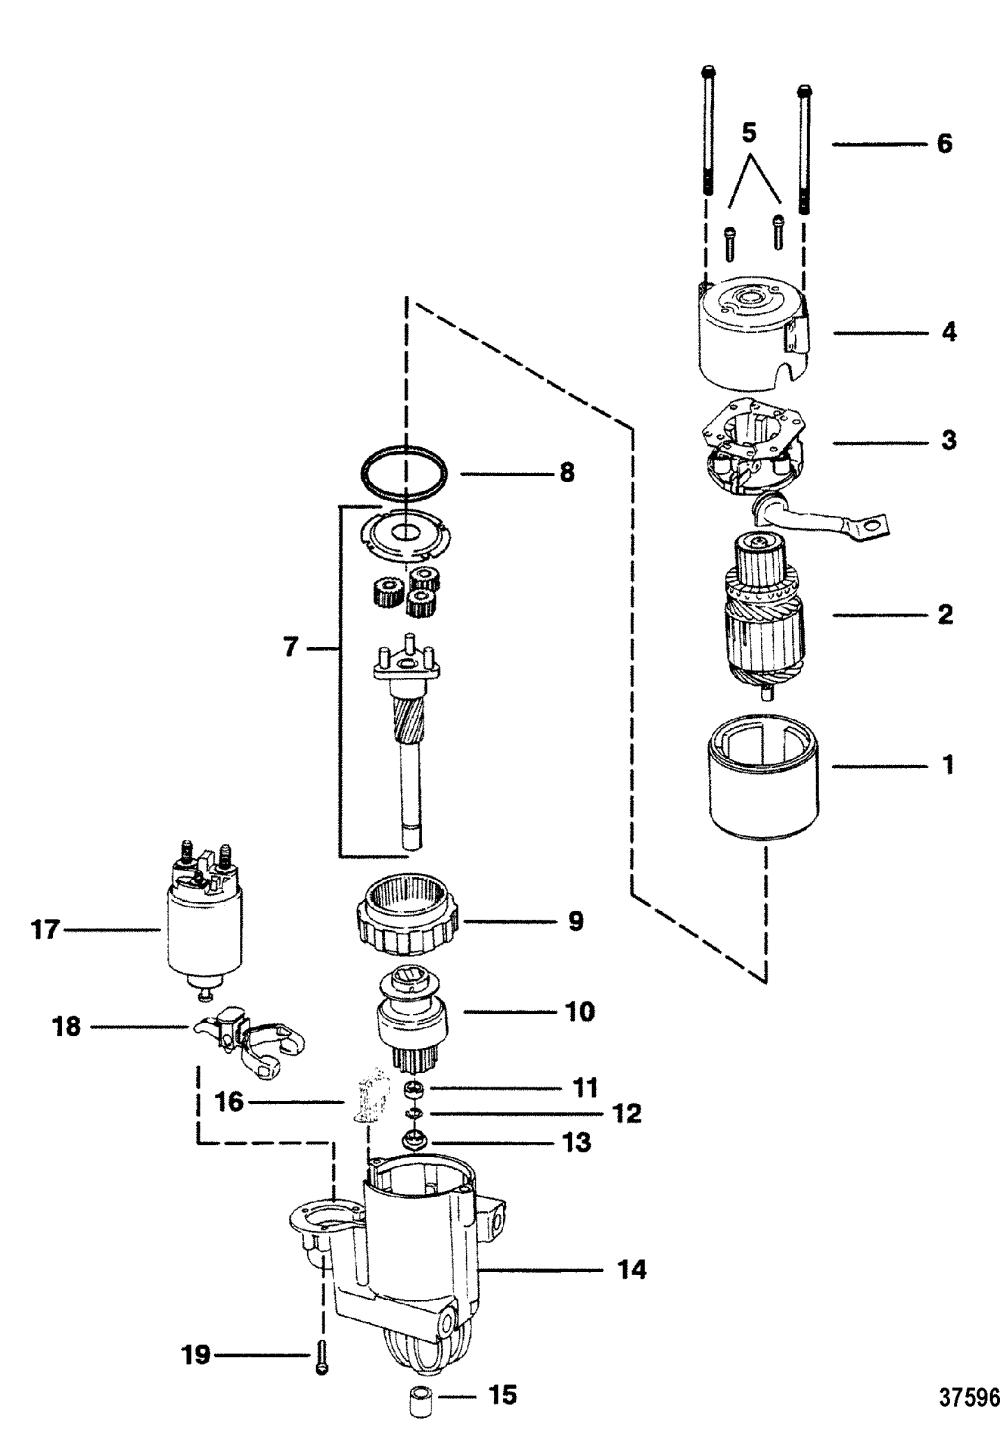 medium resolution of starter motor 8 pg 260 2 7 8 diameter end cap for mercruiser 4 3l 4 3lx alpha one engine 262 cid gen ii